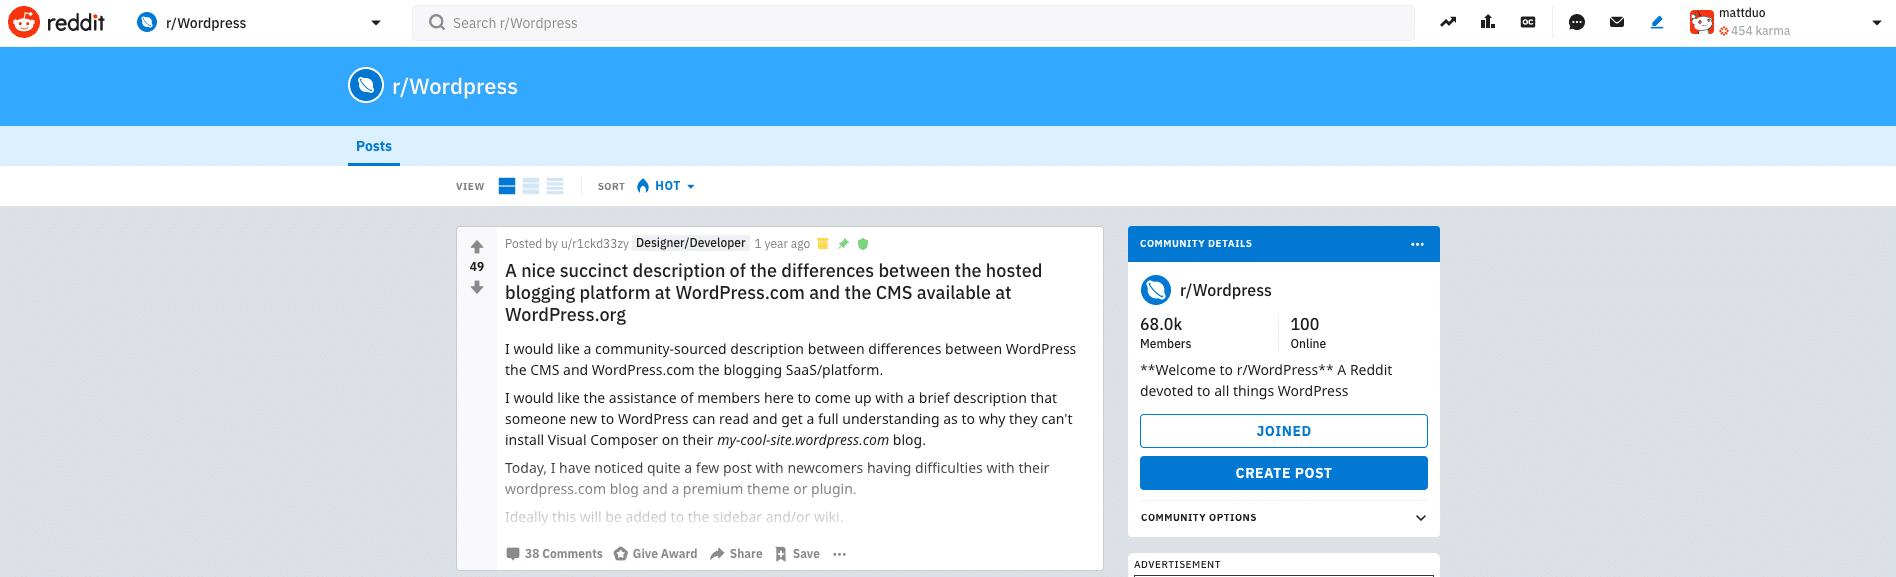 WordPress no Reddit